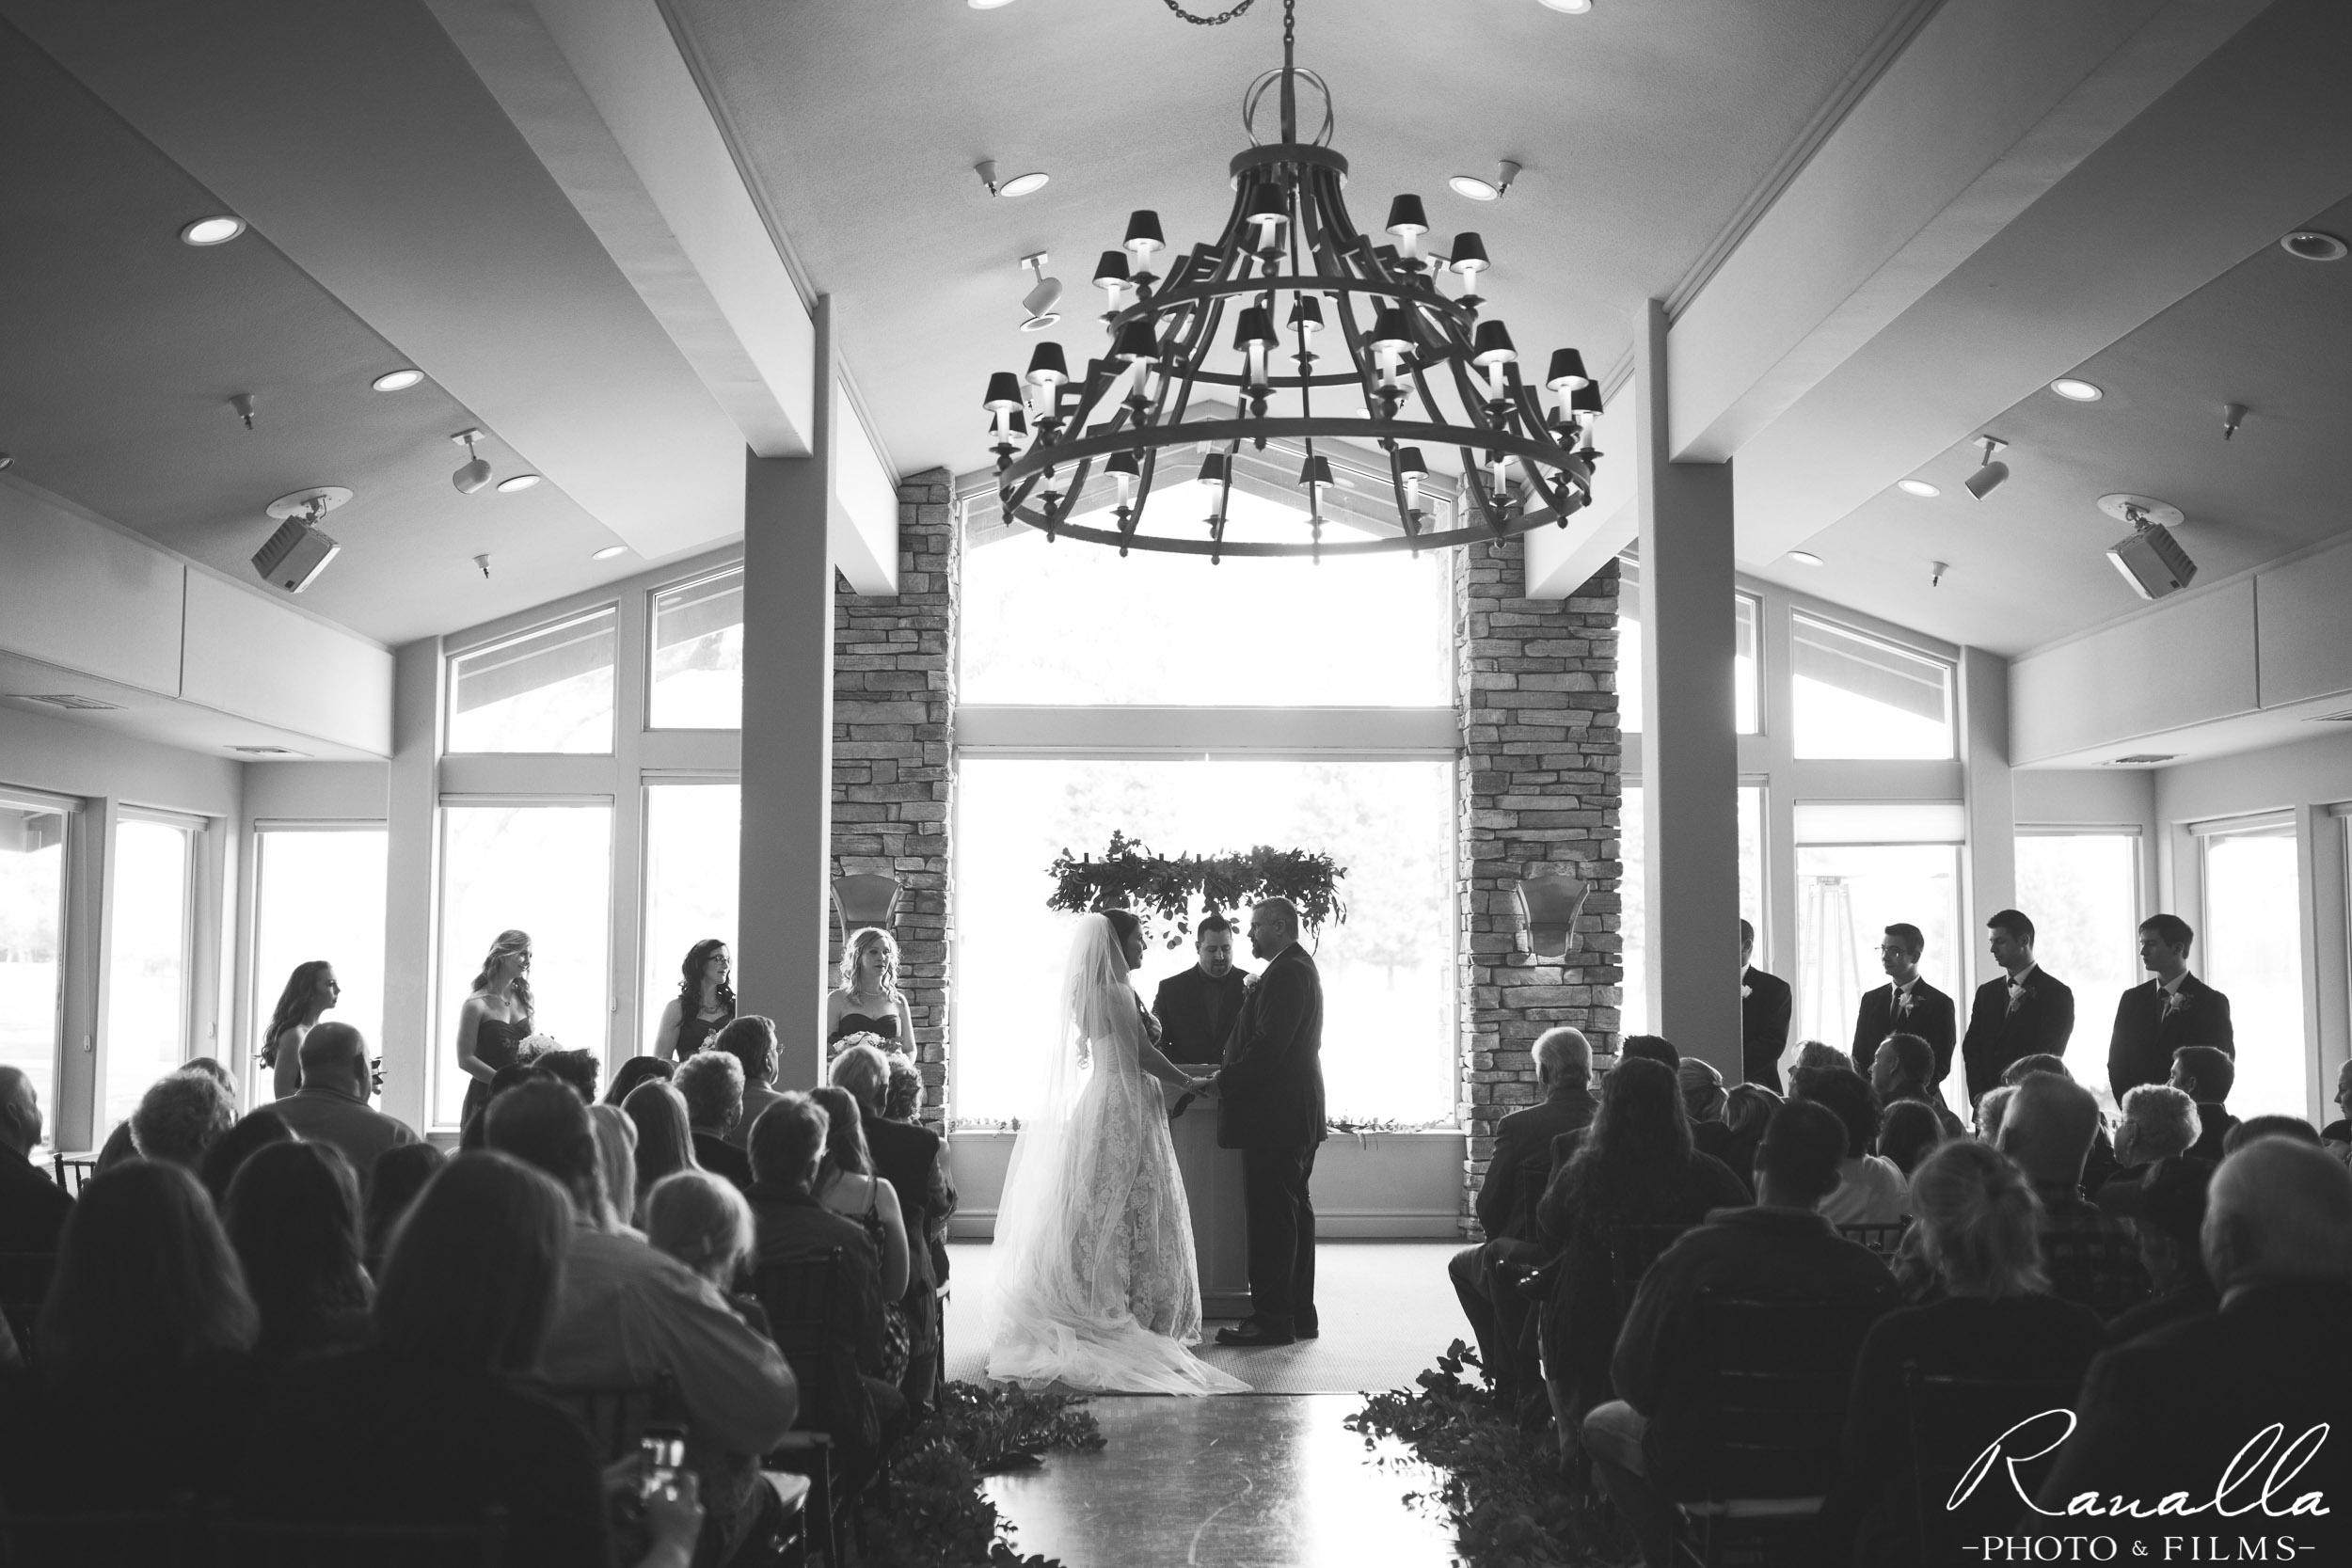 butte creek country club wedding - chico wedding photography - ranalla photo & films-621.jpg